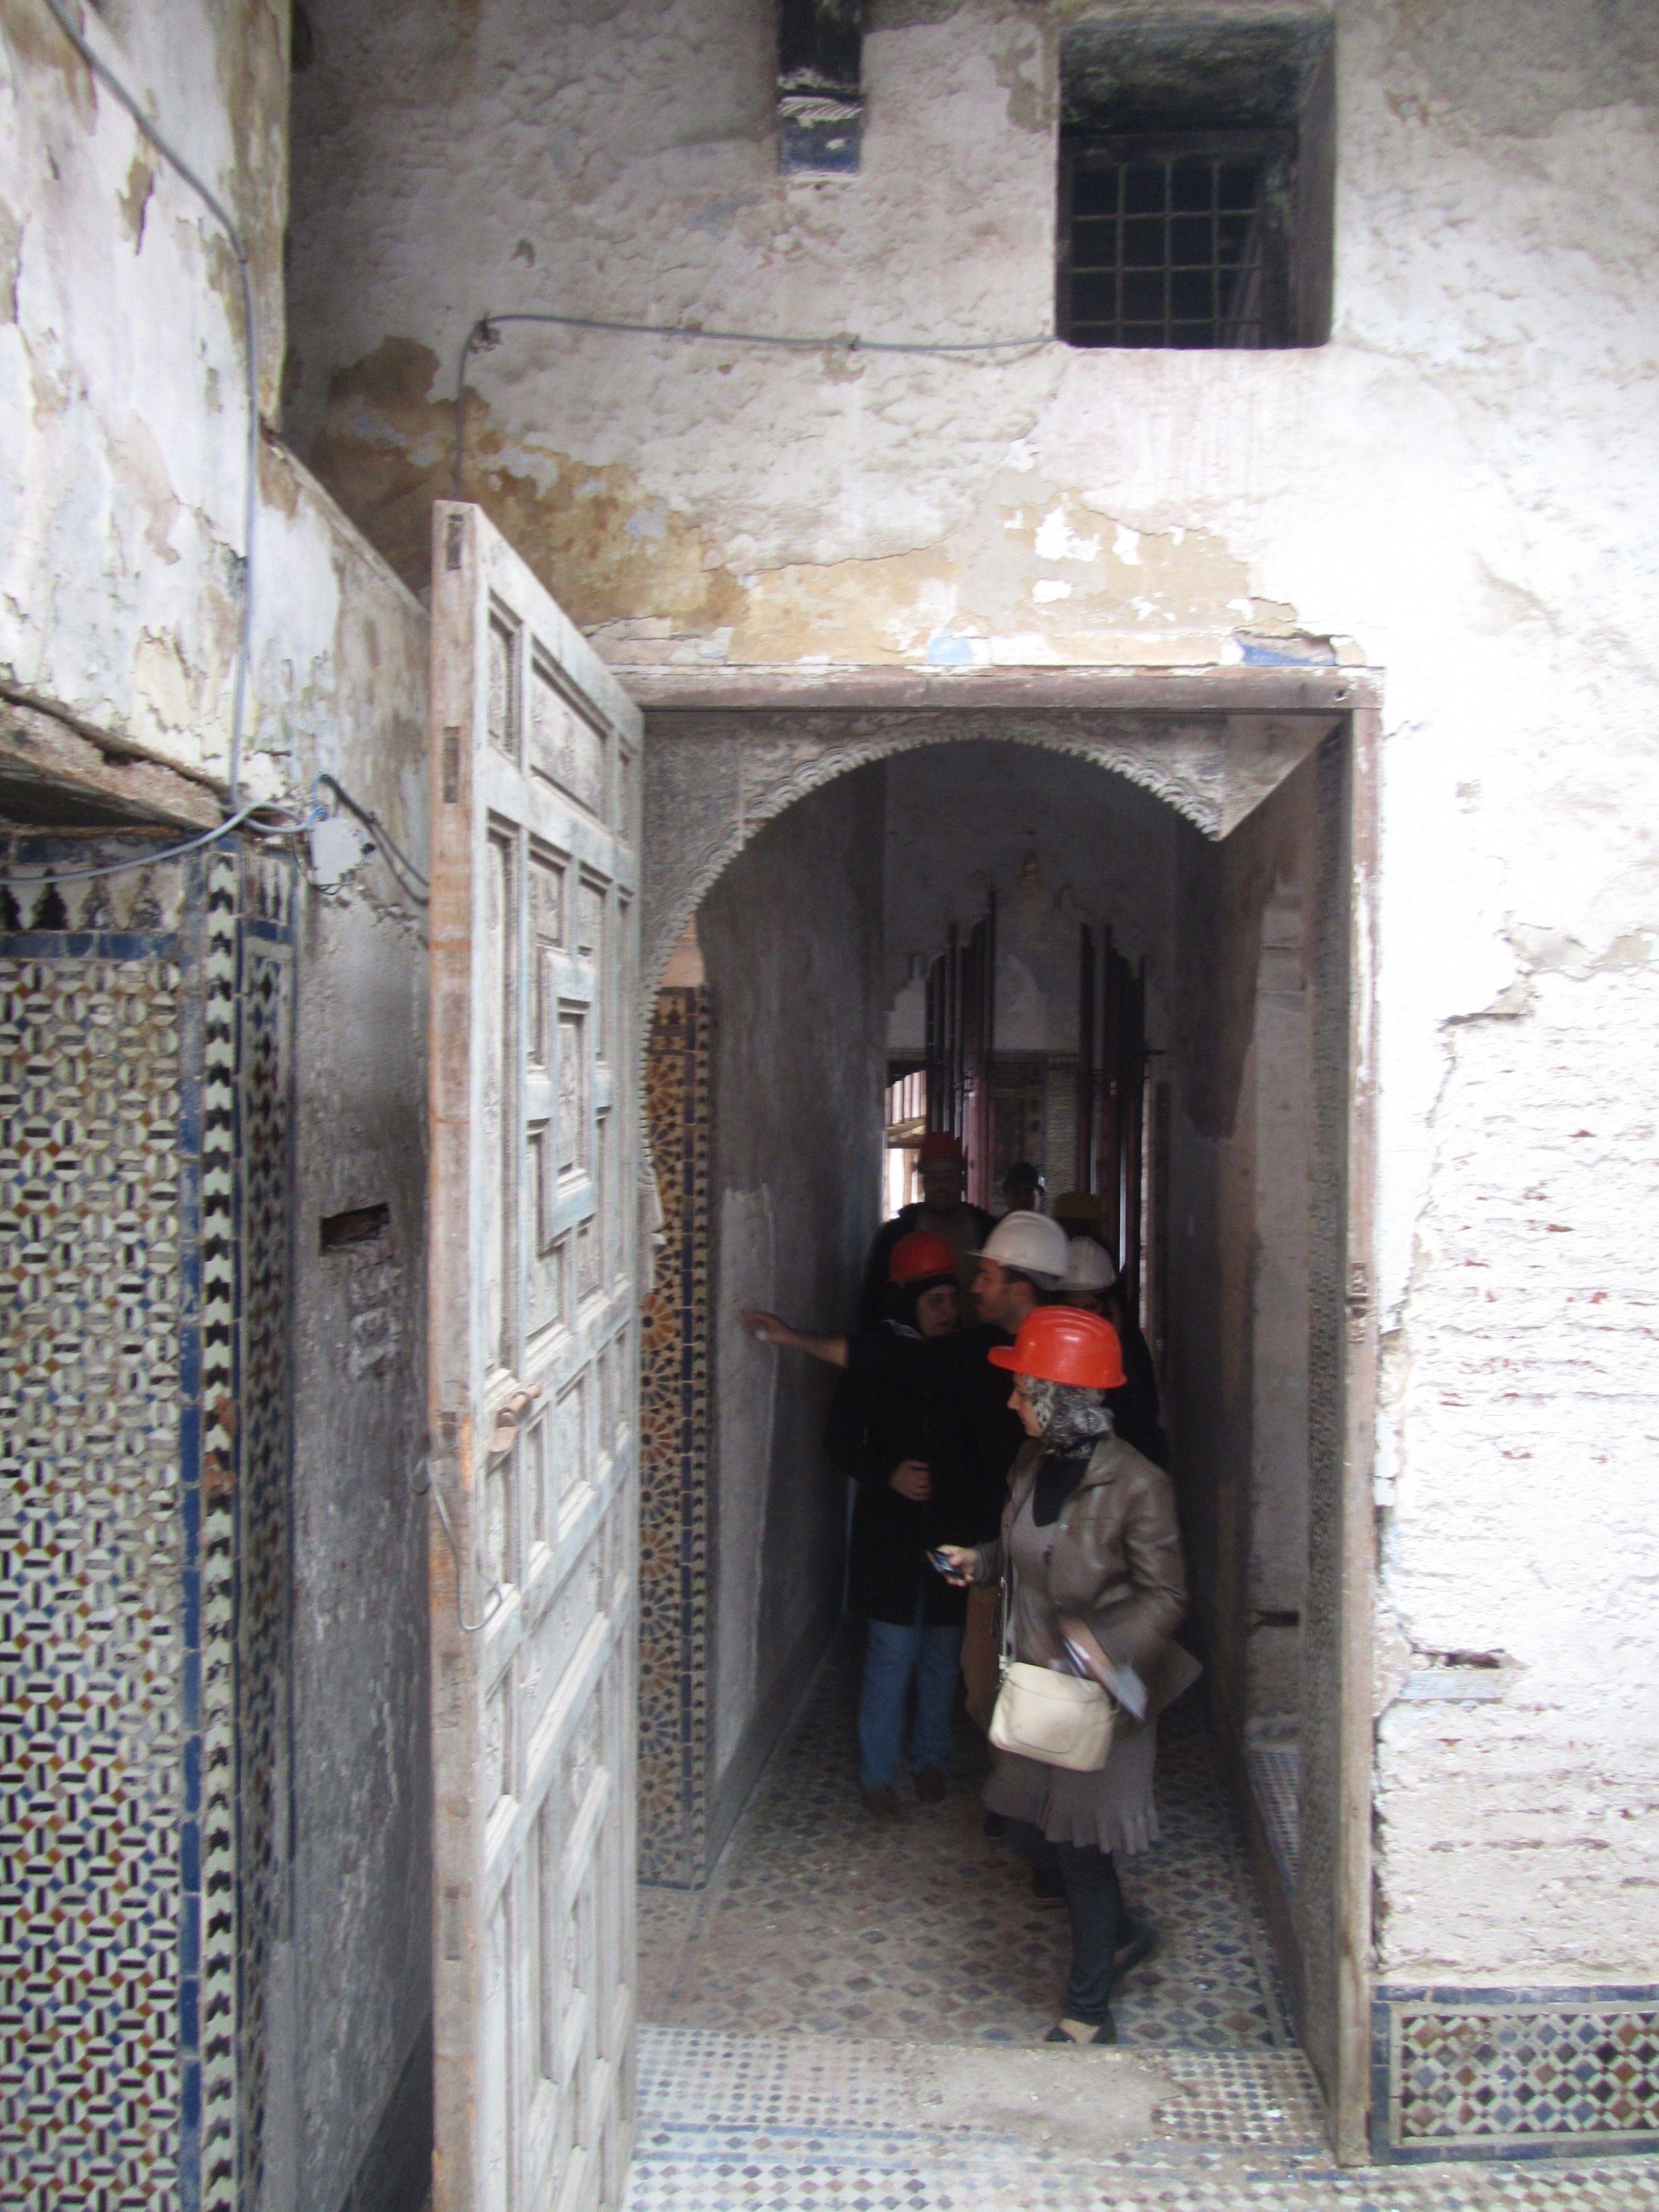 Tetouan أعمال ترميم المدرسة القديمة للا سكينة أبواب الدار الأثرية وممراتها من الداخل Decor Photo Fireplace